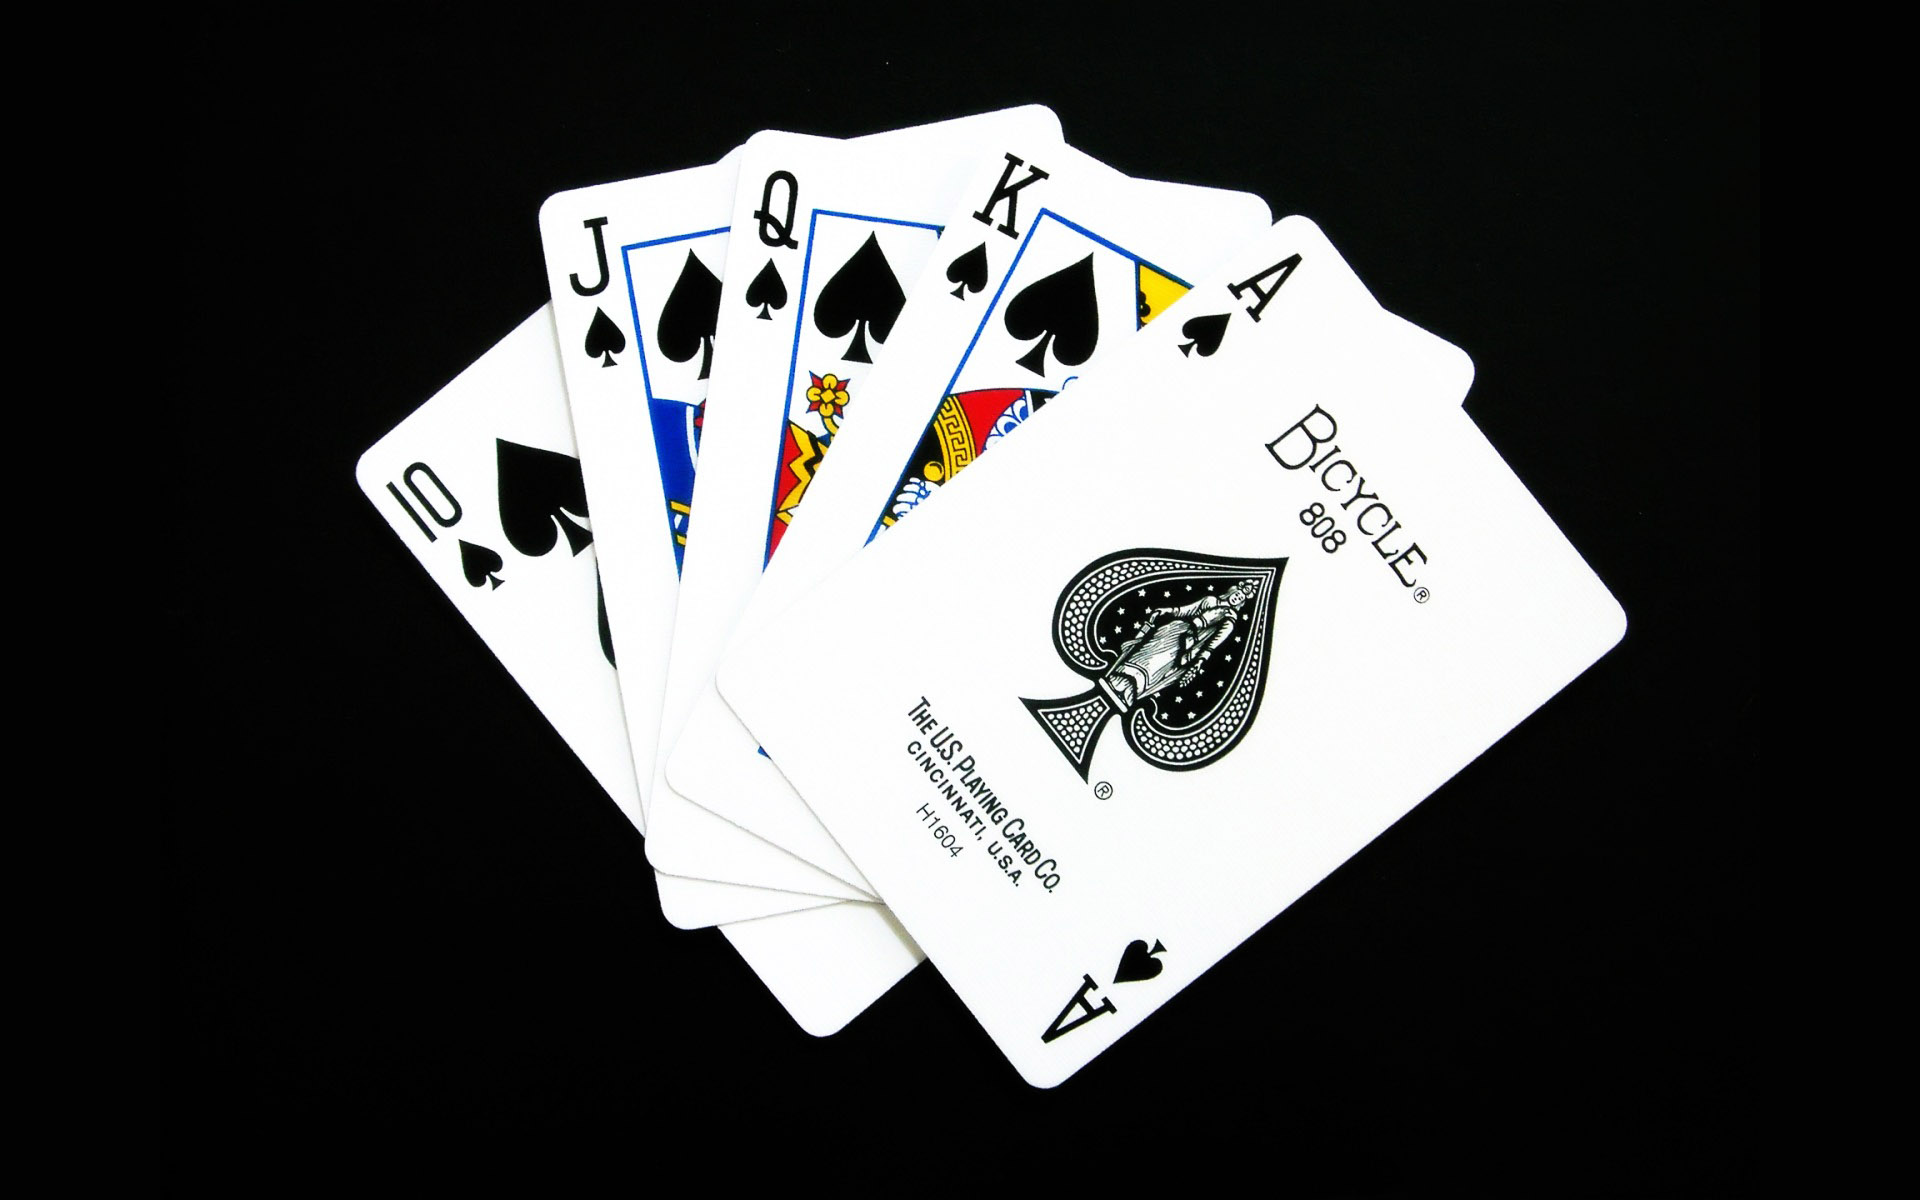 Card casino black casino gambling jack roulette